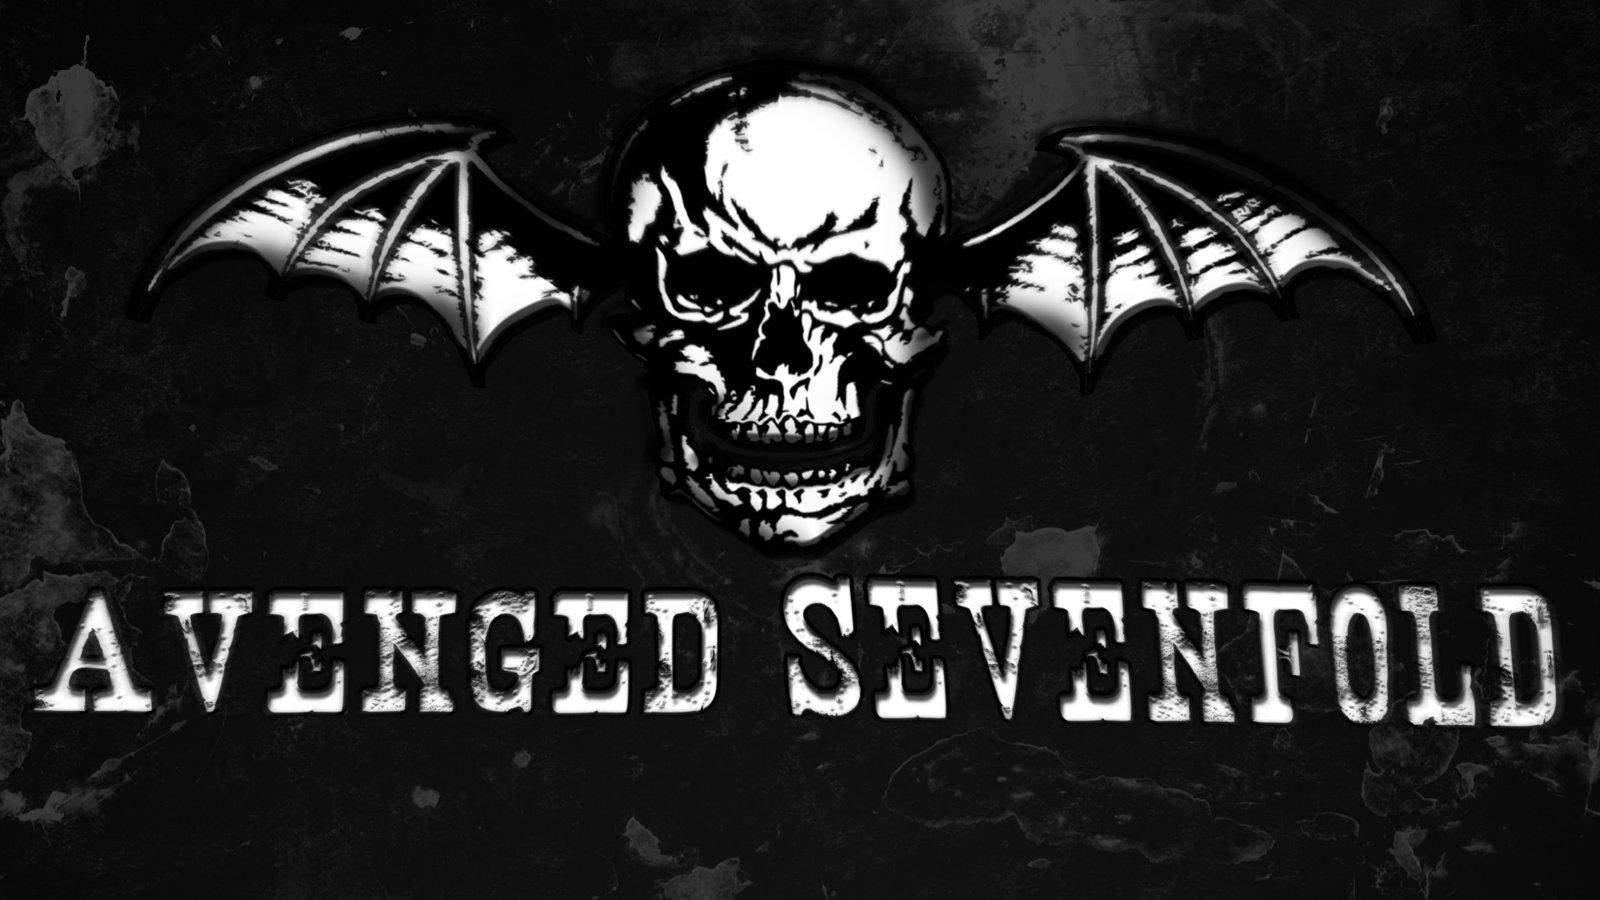 Avenged Sevenfold Deathbat Wallpaper 1920X1080 by ChaoticHazard on 1600x900